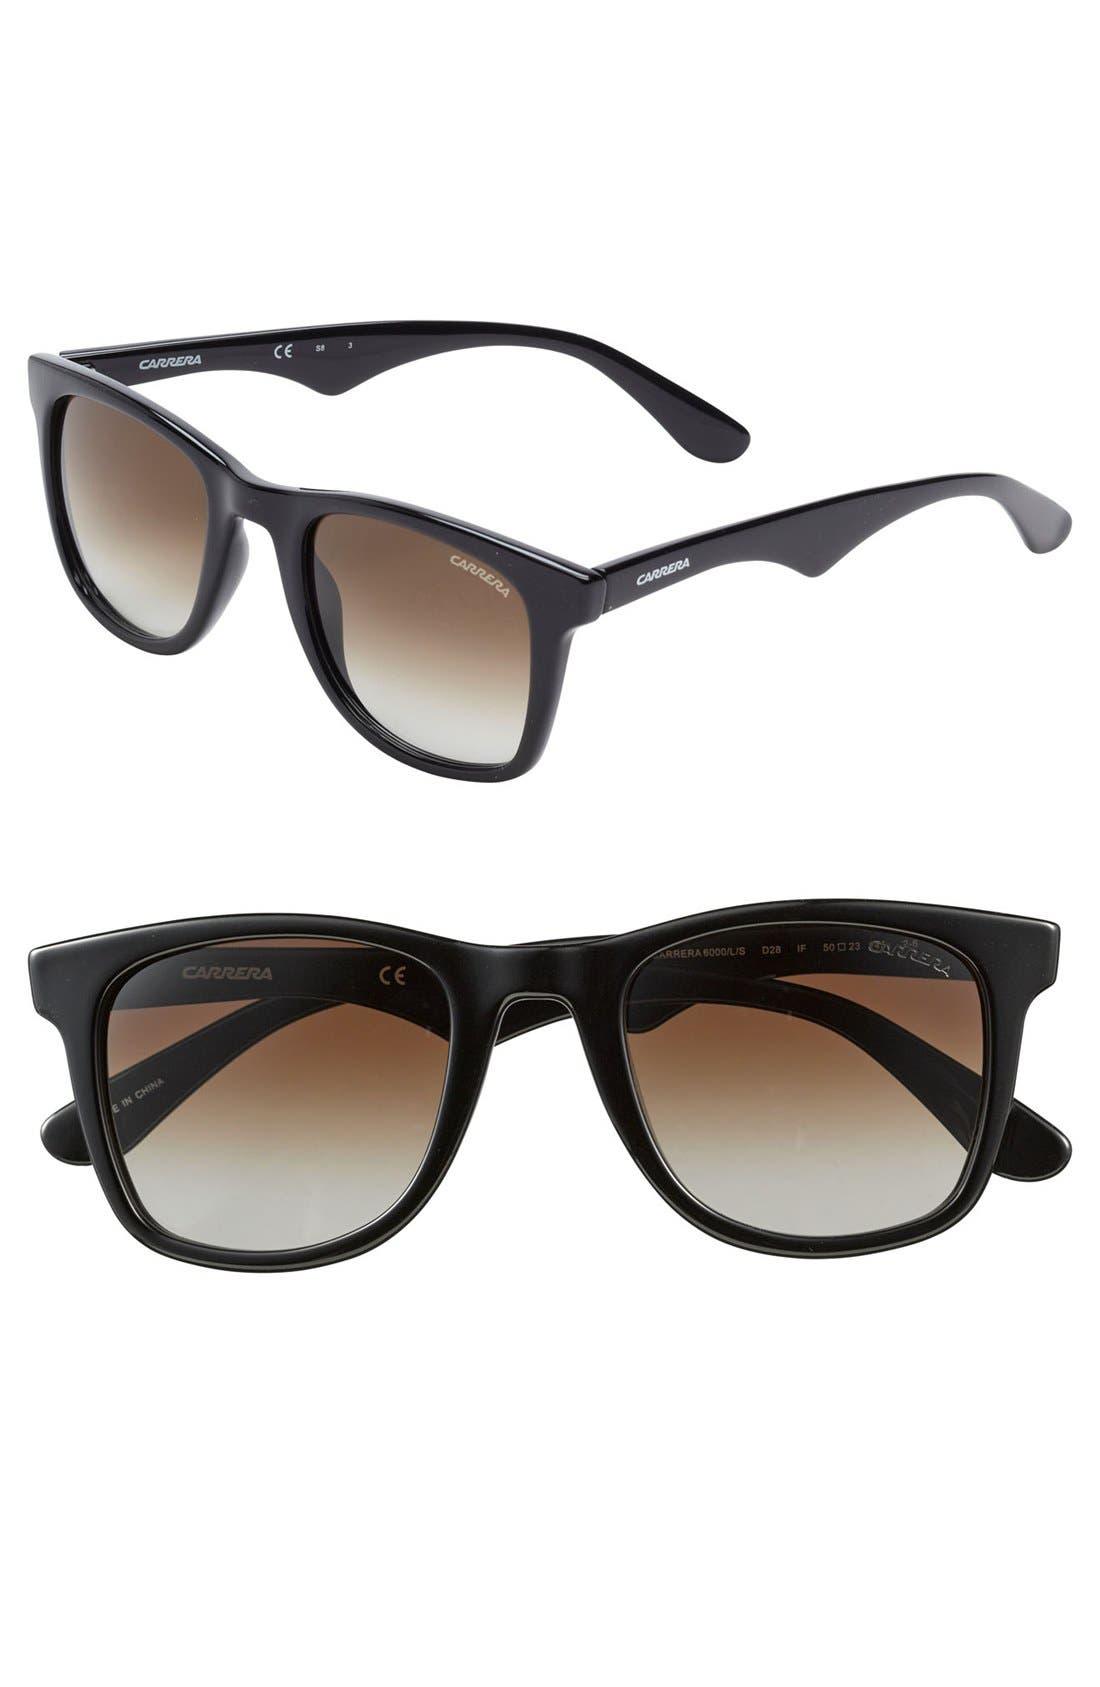 Alternate Image 1 Selected - Carrera Eyewear '6000' 50mm Sunglasses